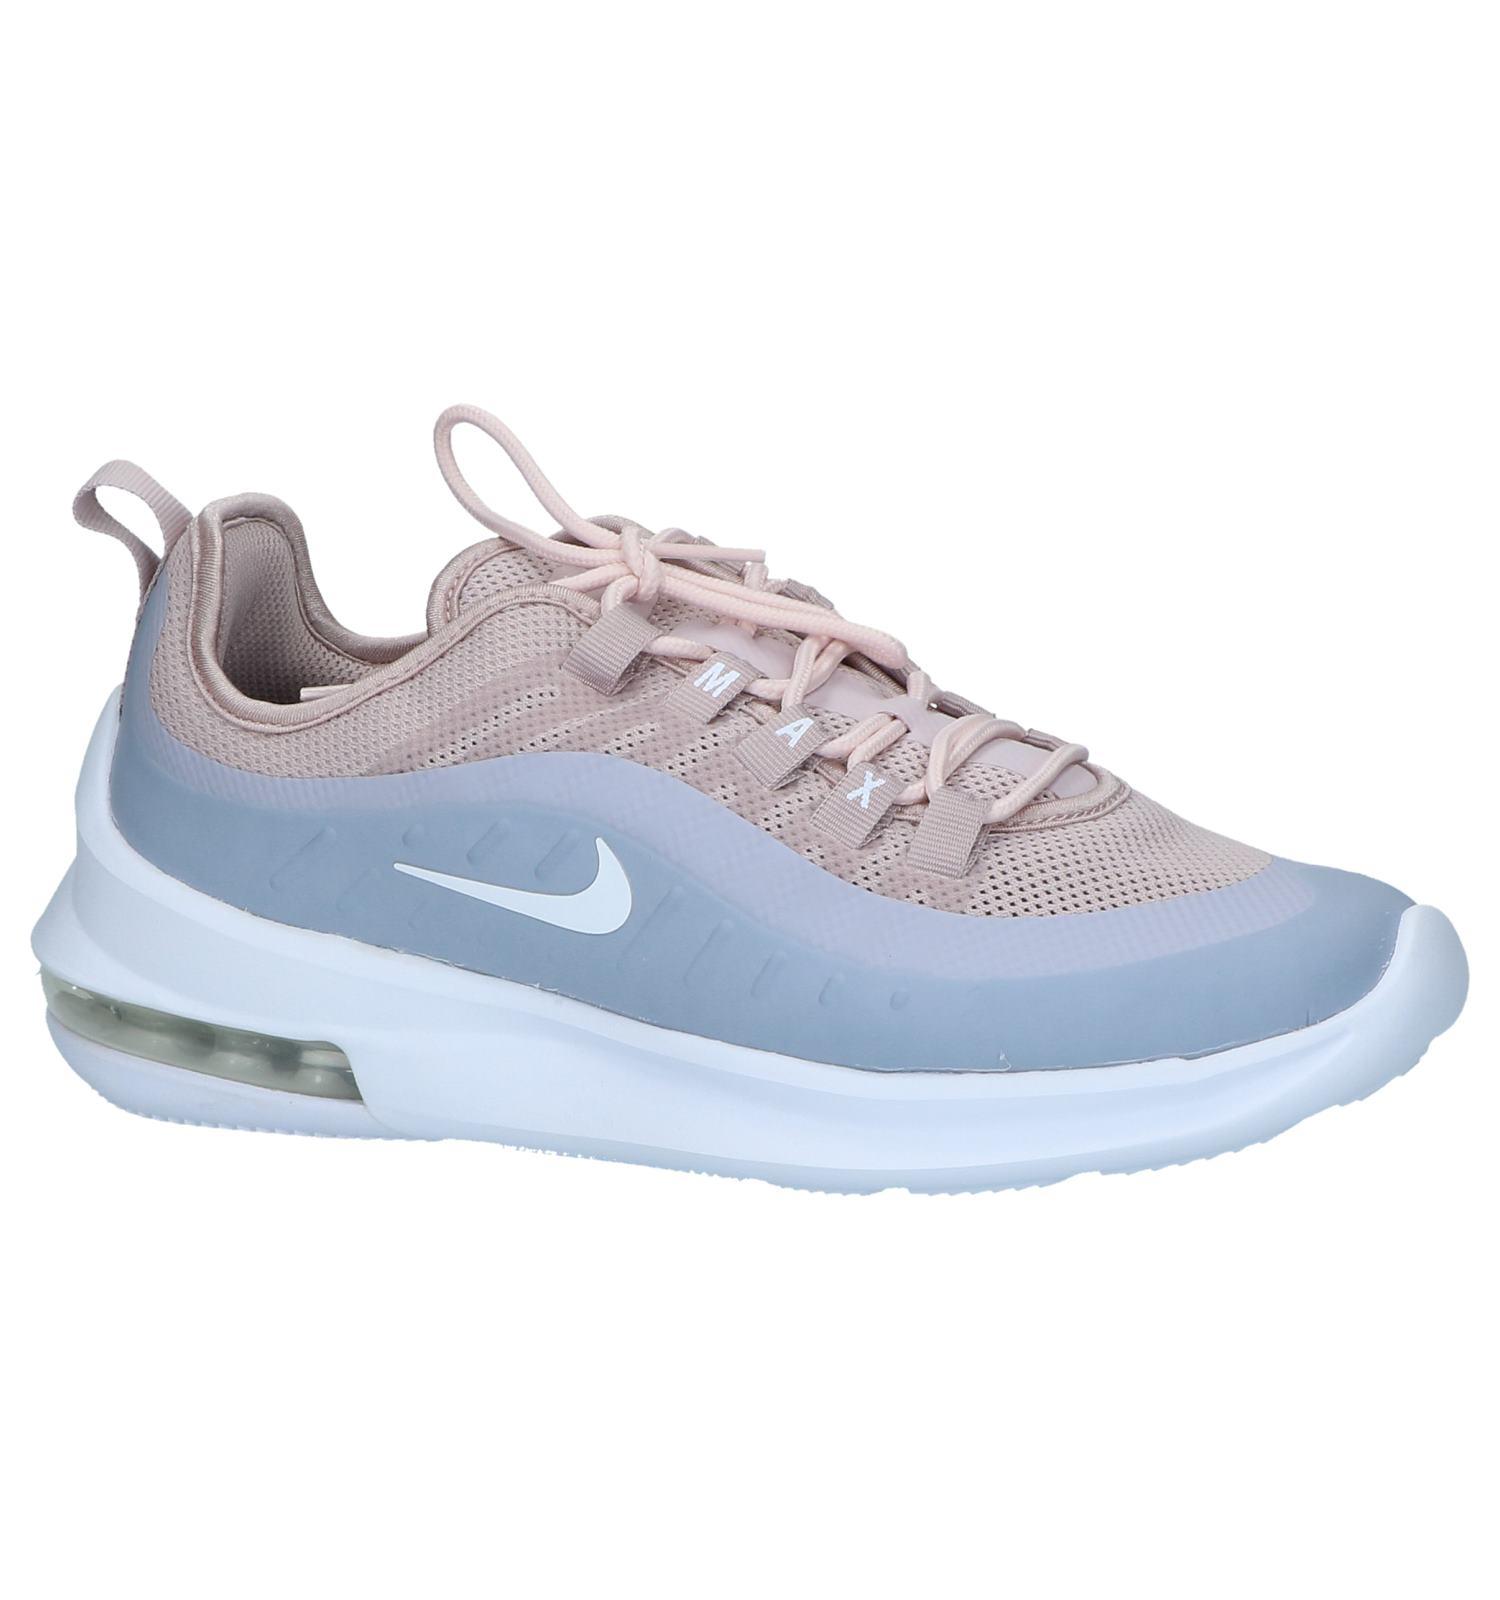 Roze Runner Sneakers Nike Air Max Axis | TORFS.BE | Gratis verzend en retour